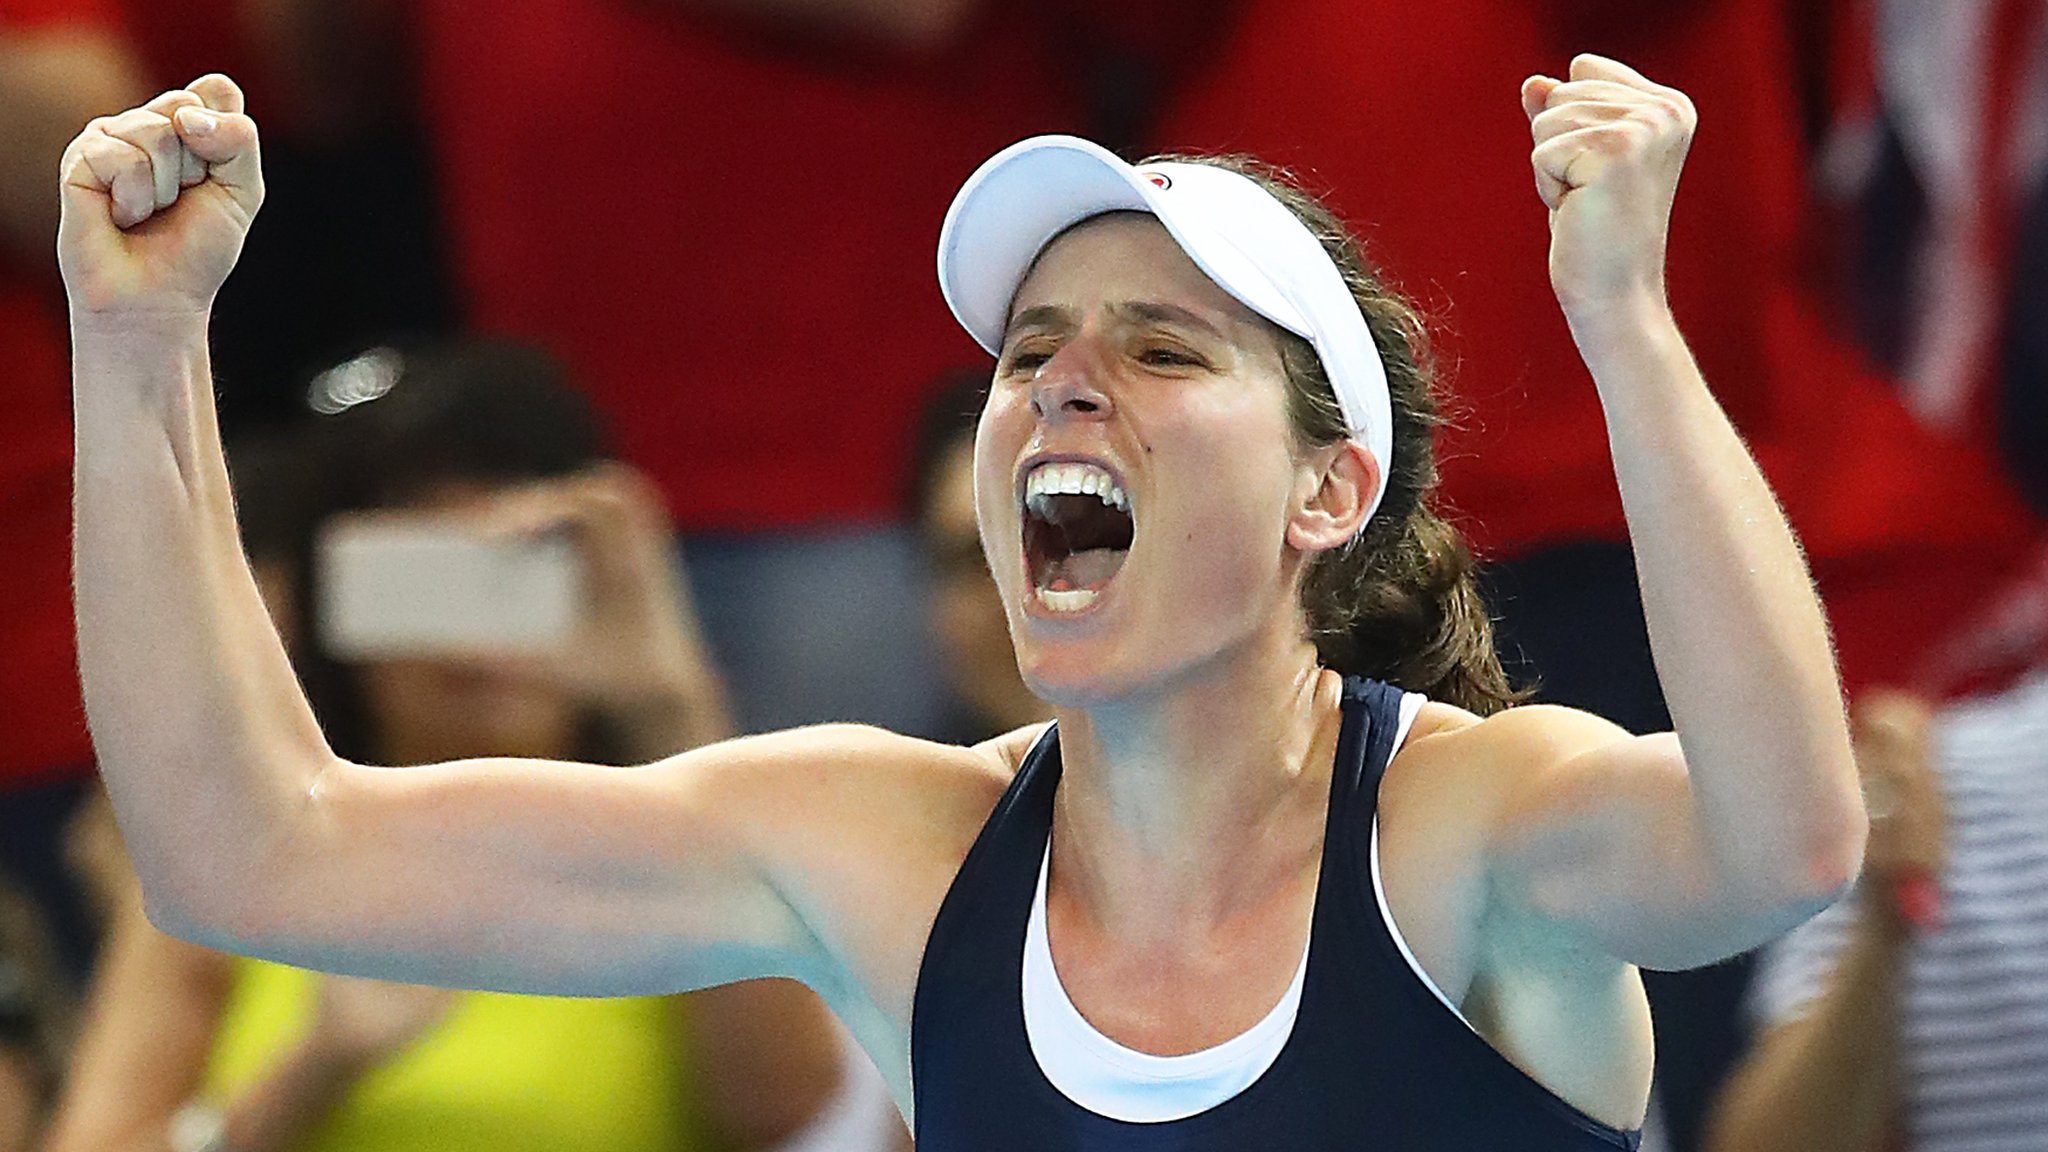 Fed Cup: Great Britain lead Kazakhstan 2-1 after Johanna Konta wins